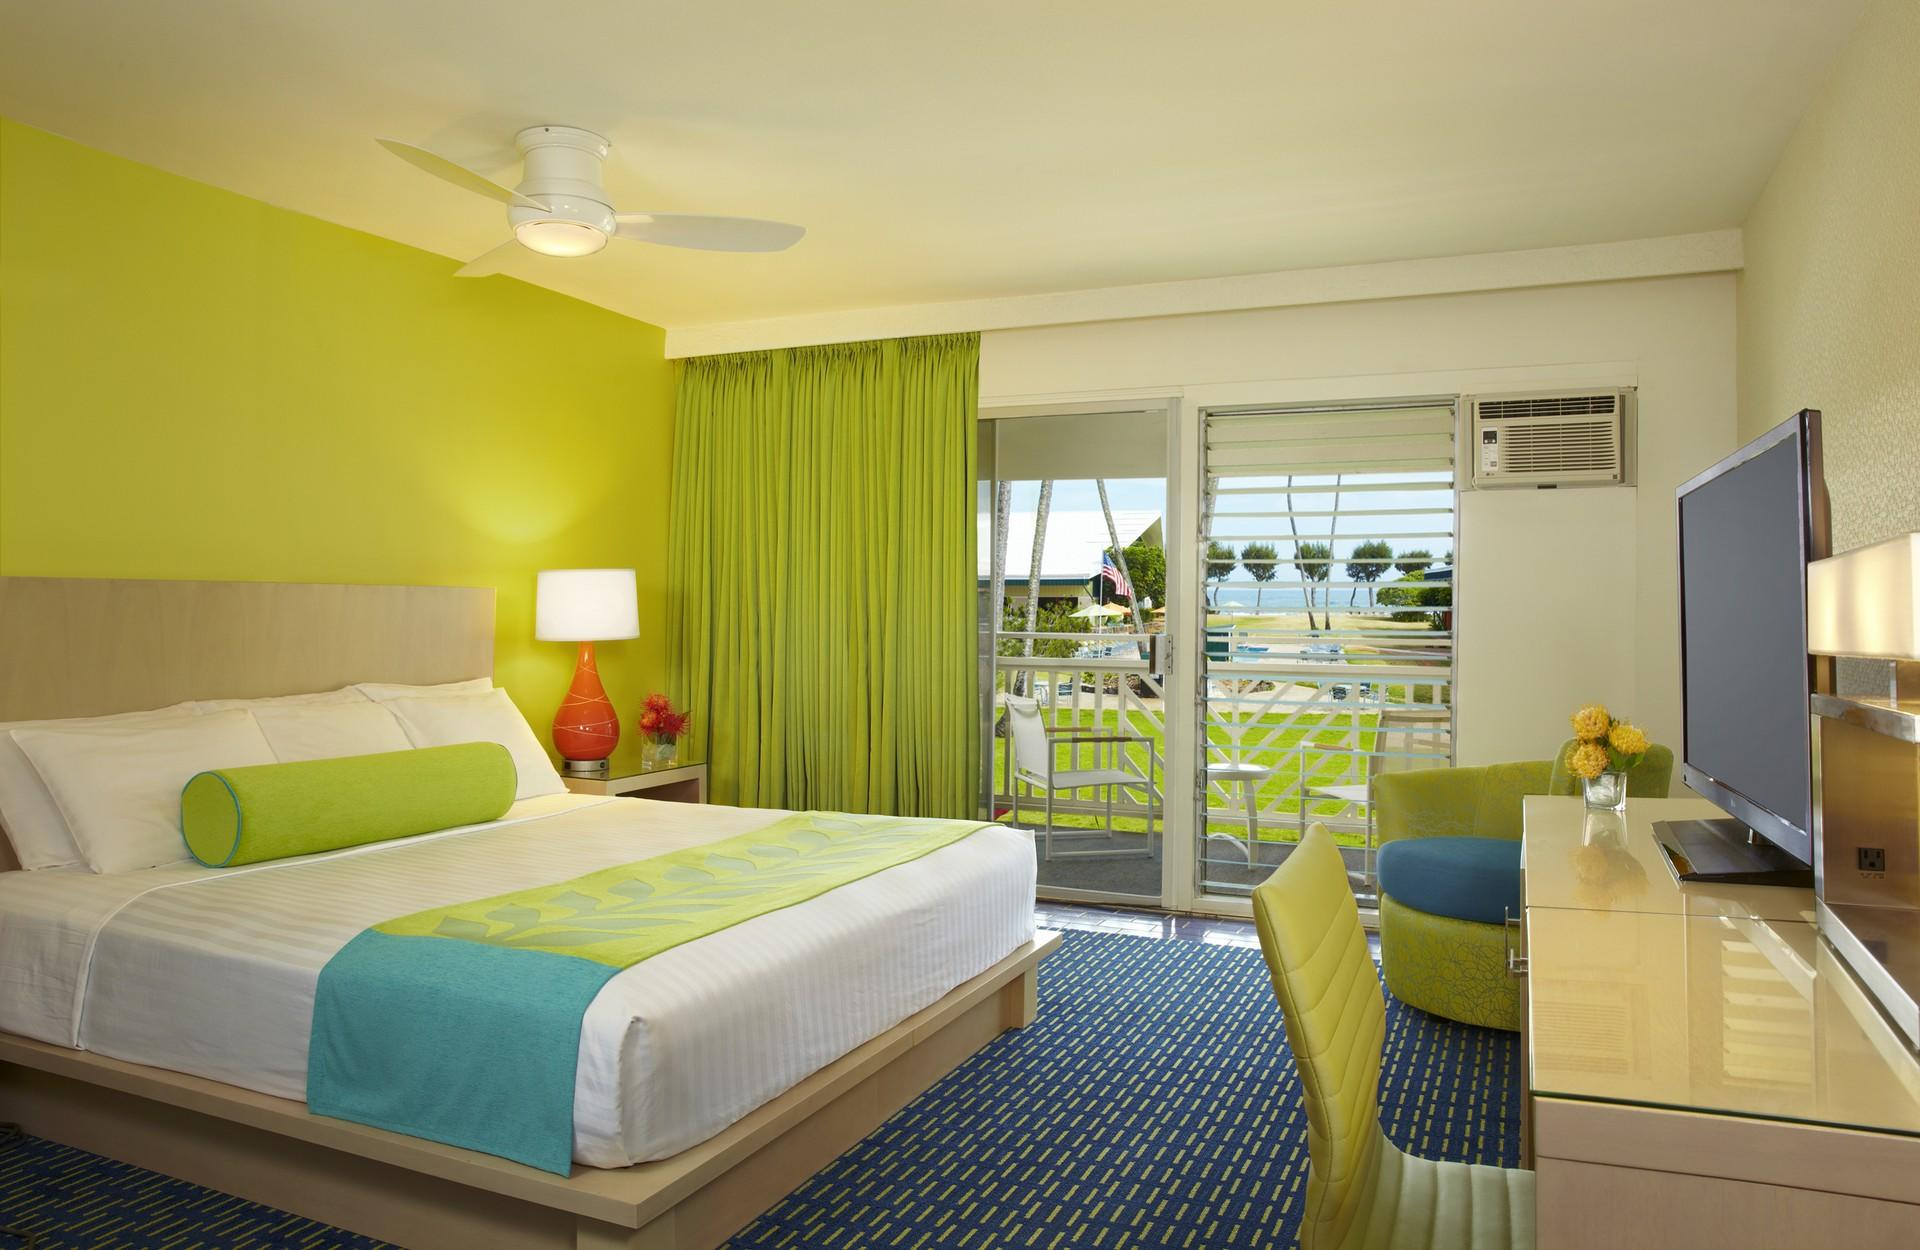 Kauai Shores Hotel image 7